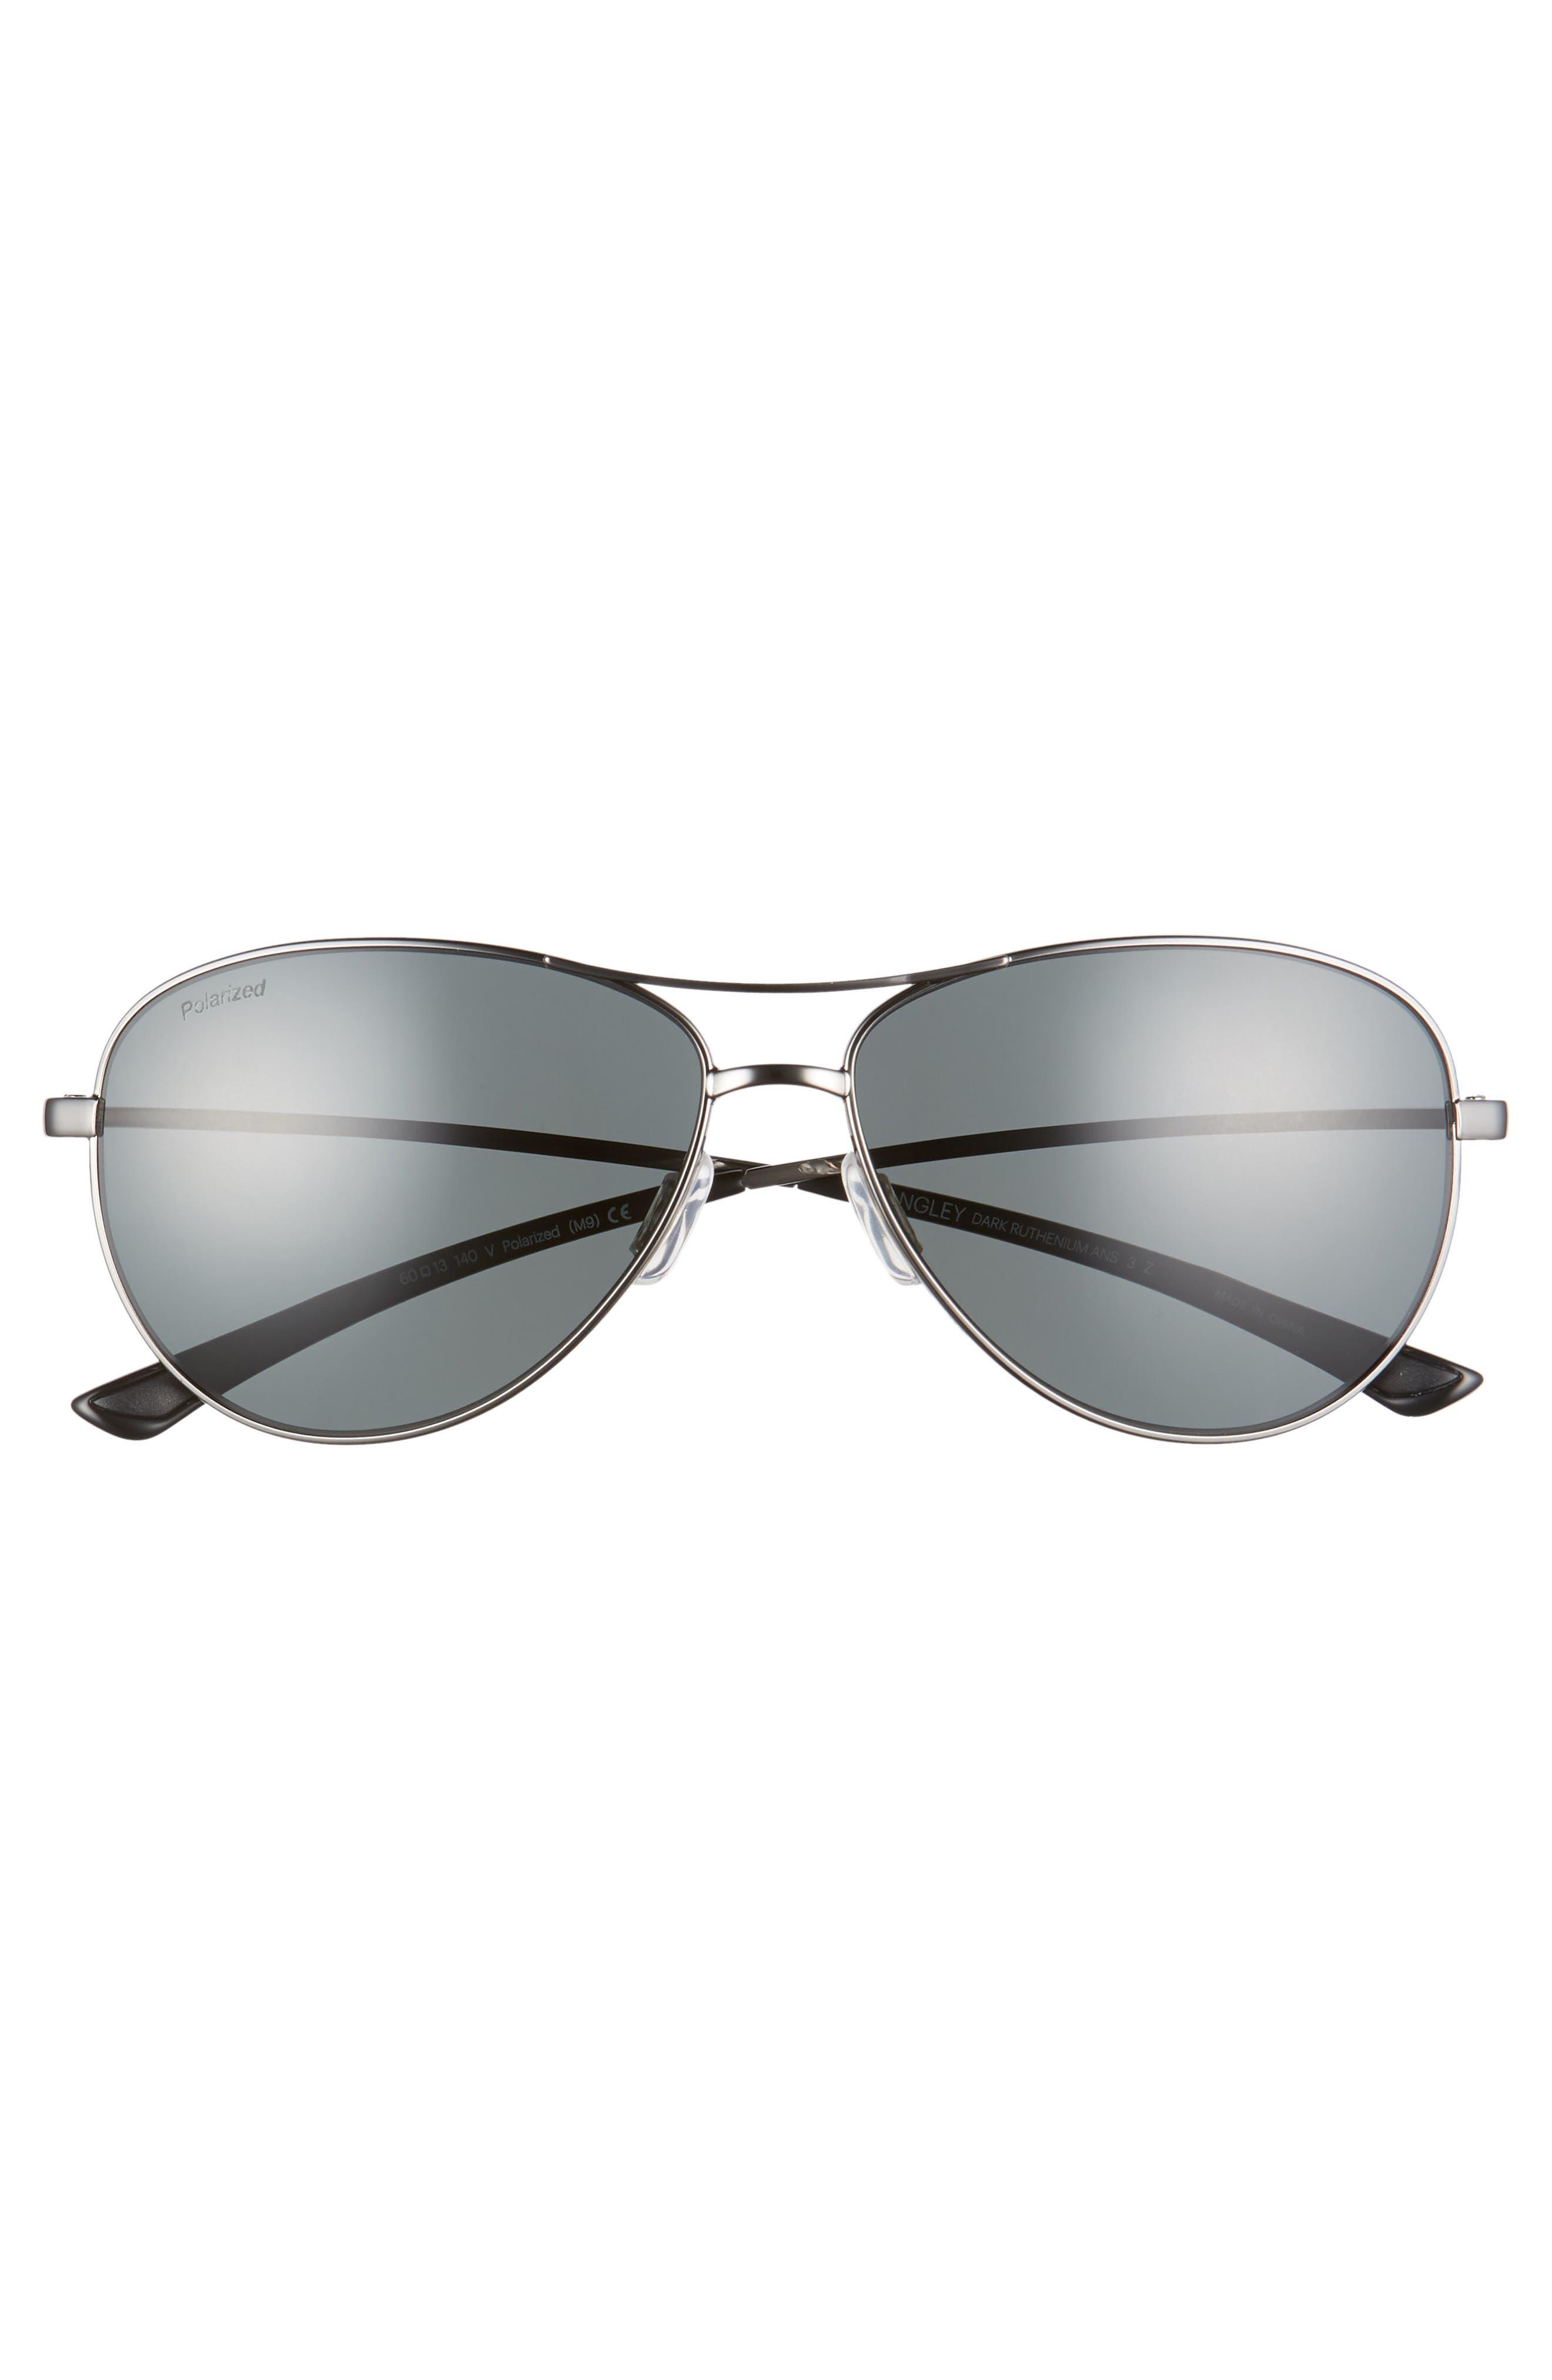 Langley 60mm ChromaPop<sup>™</sup> Polarized Aviator Sunglasses,                             Alternate thumbnail 3, color,                             DARK RUTHENIUM/ GREY